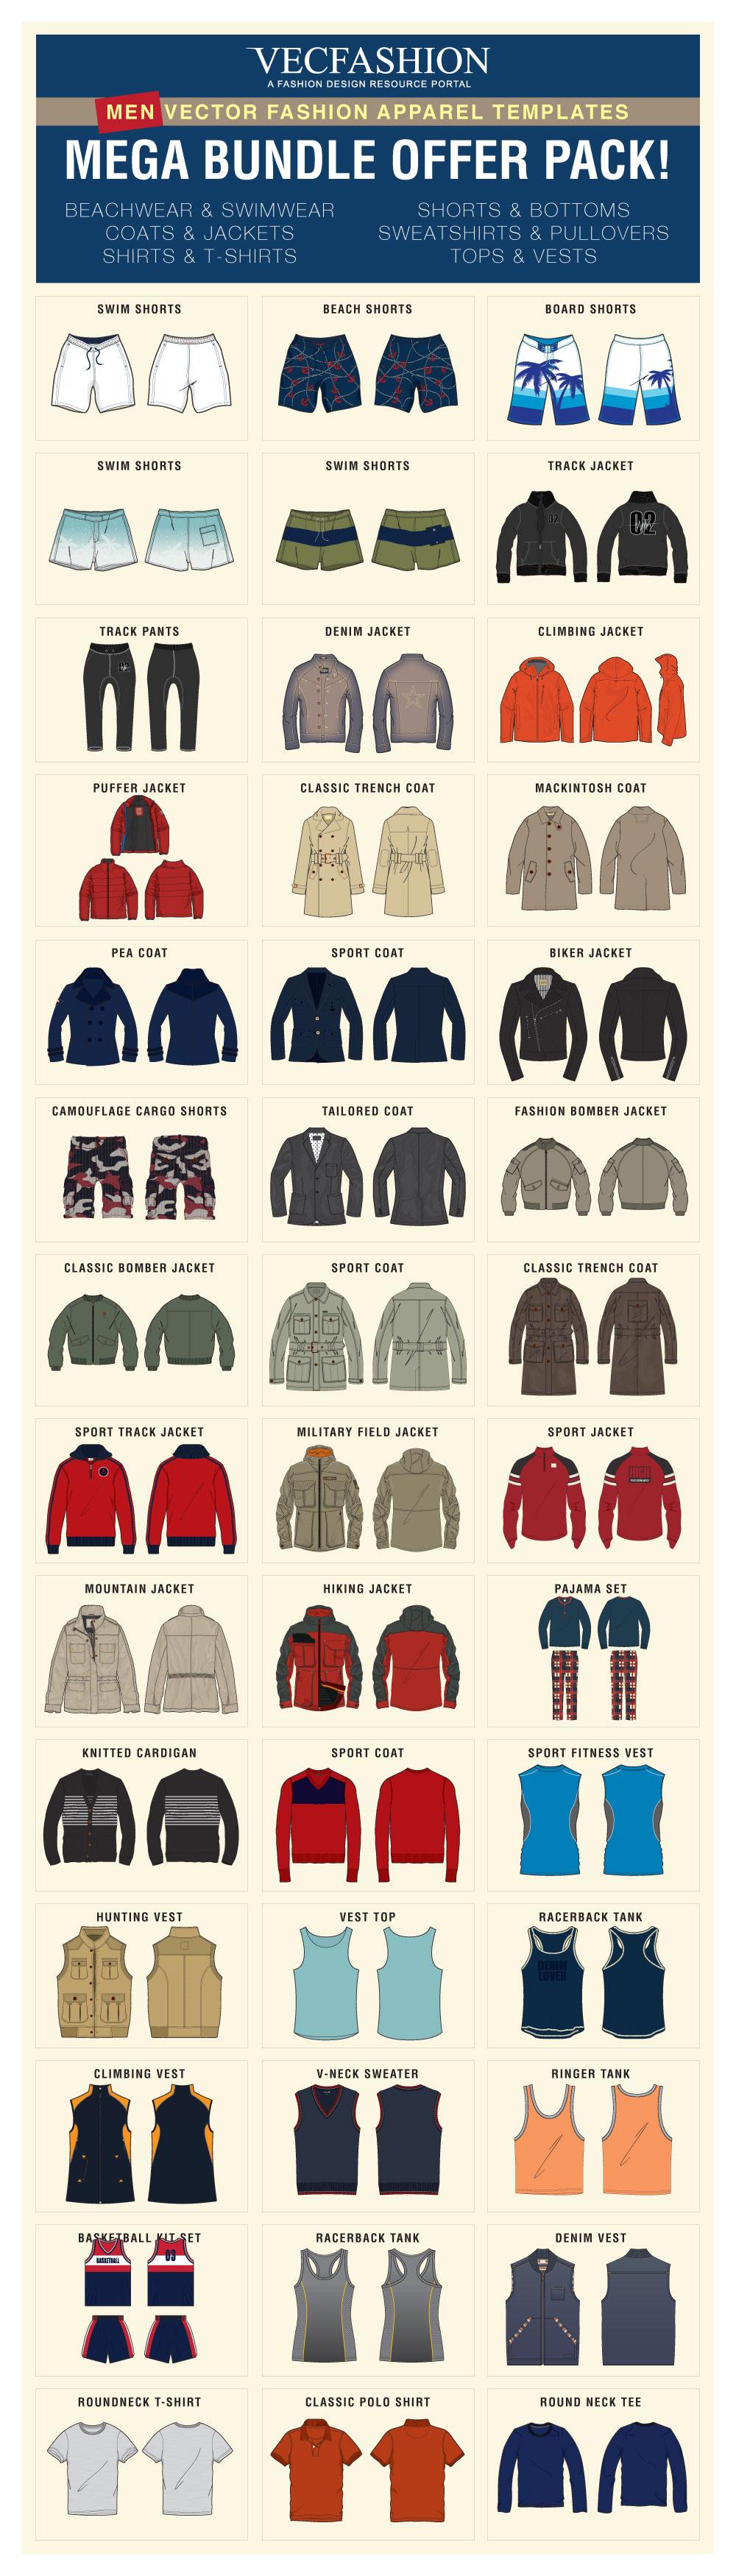 Men Fashion Templates Mega Bundle Offer Pack! example image 2